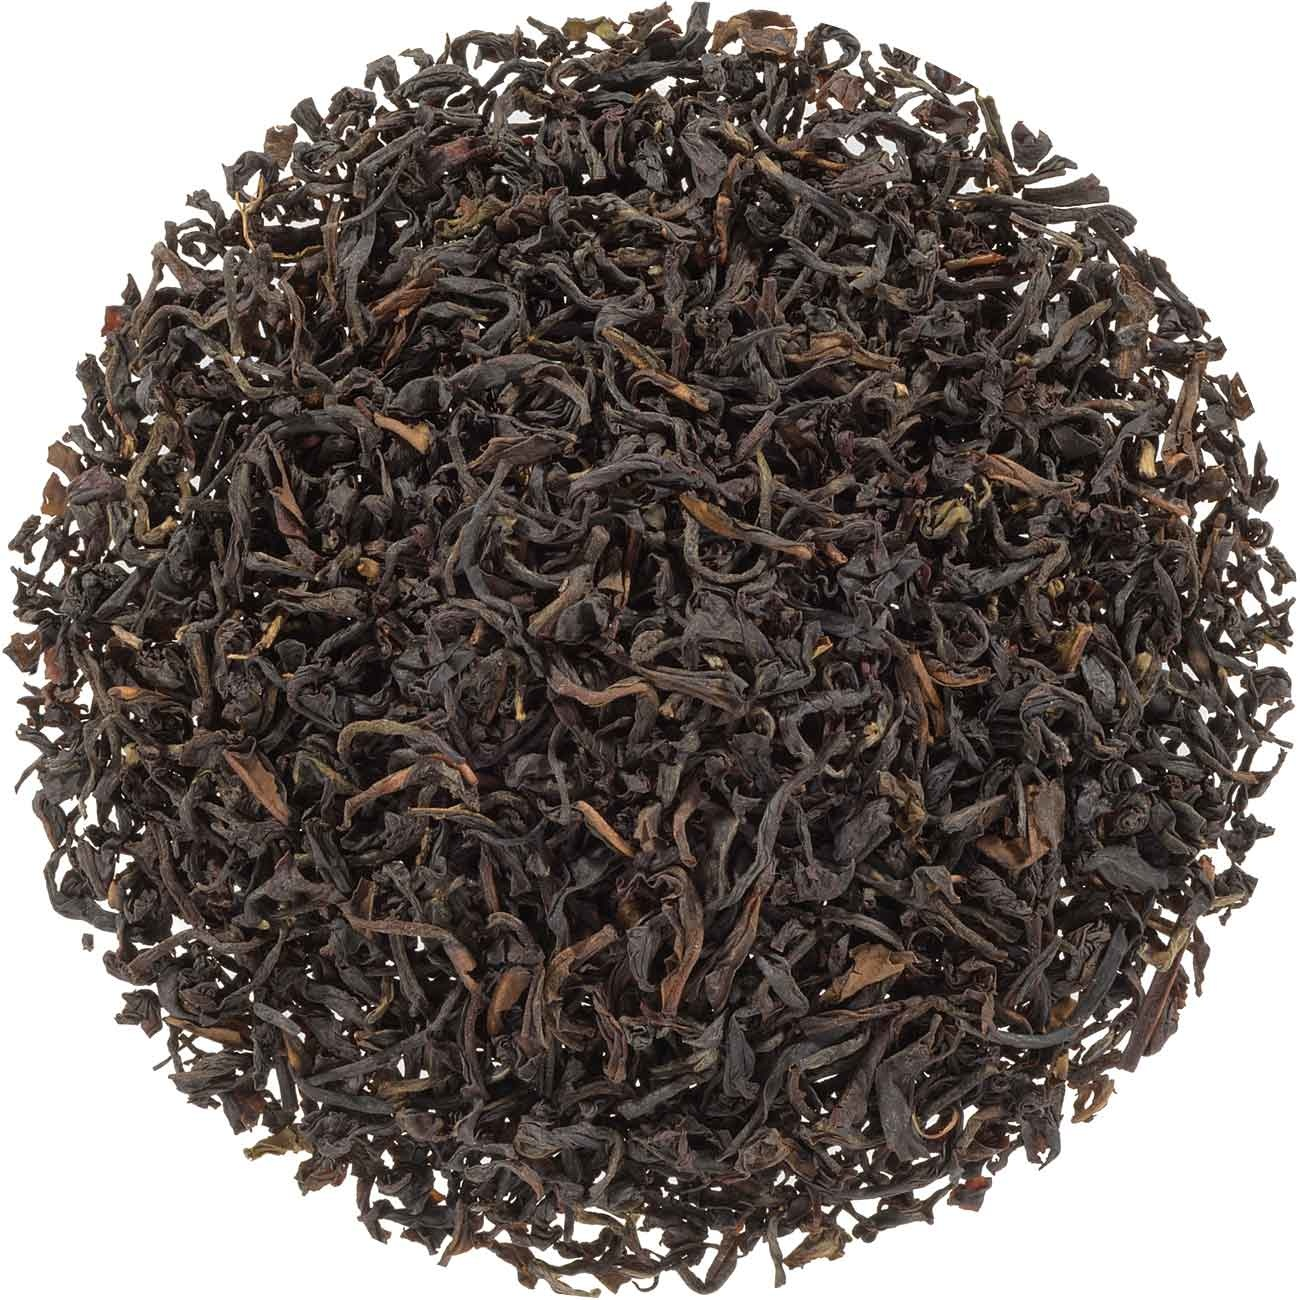 Puur Natuur Colombian Organic Black Tea-2